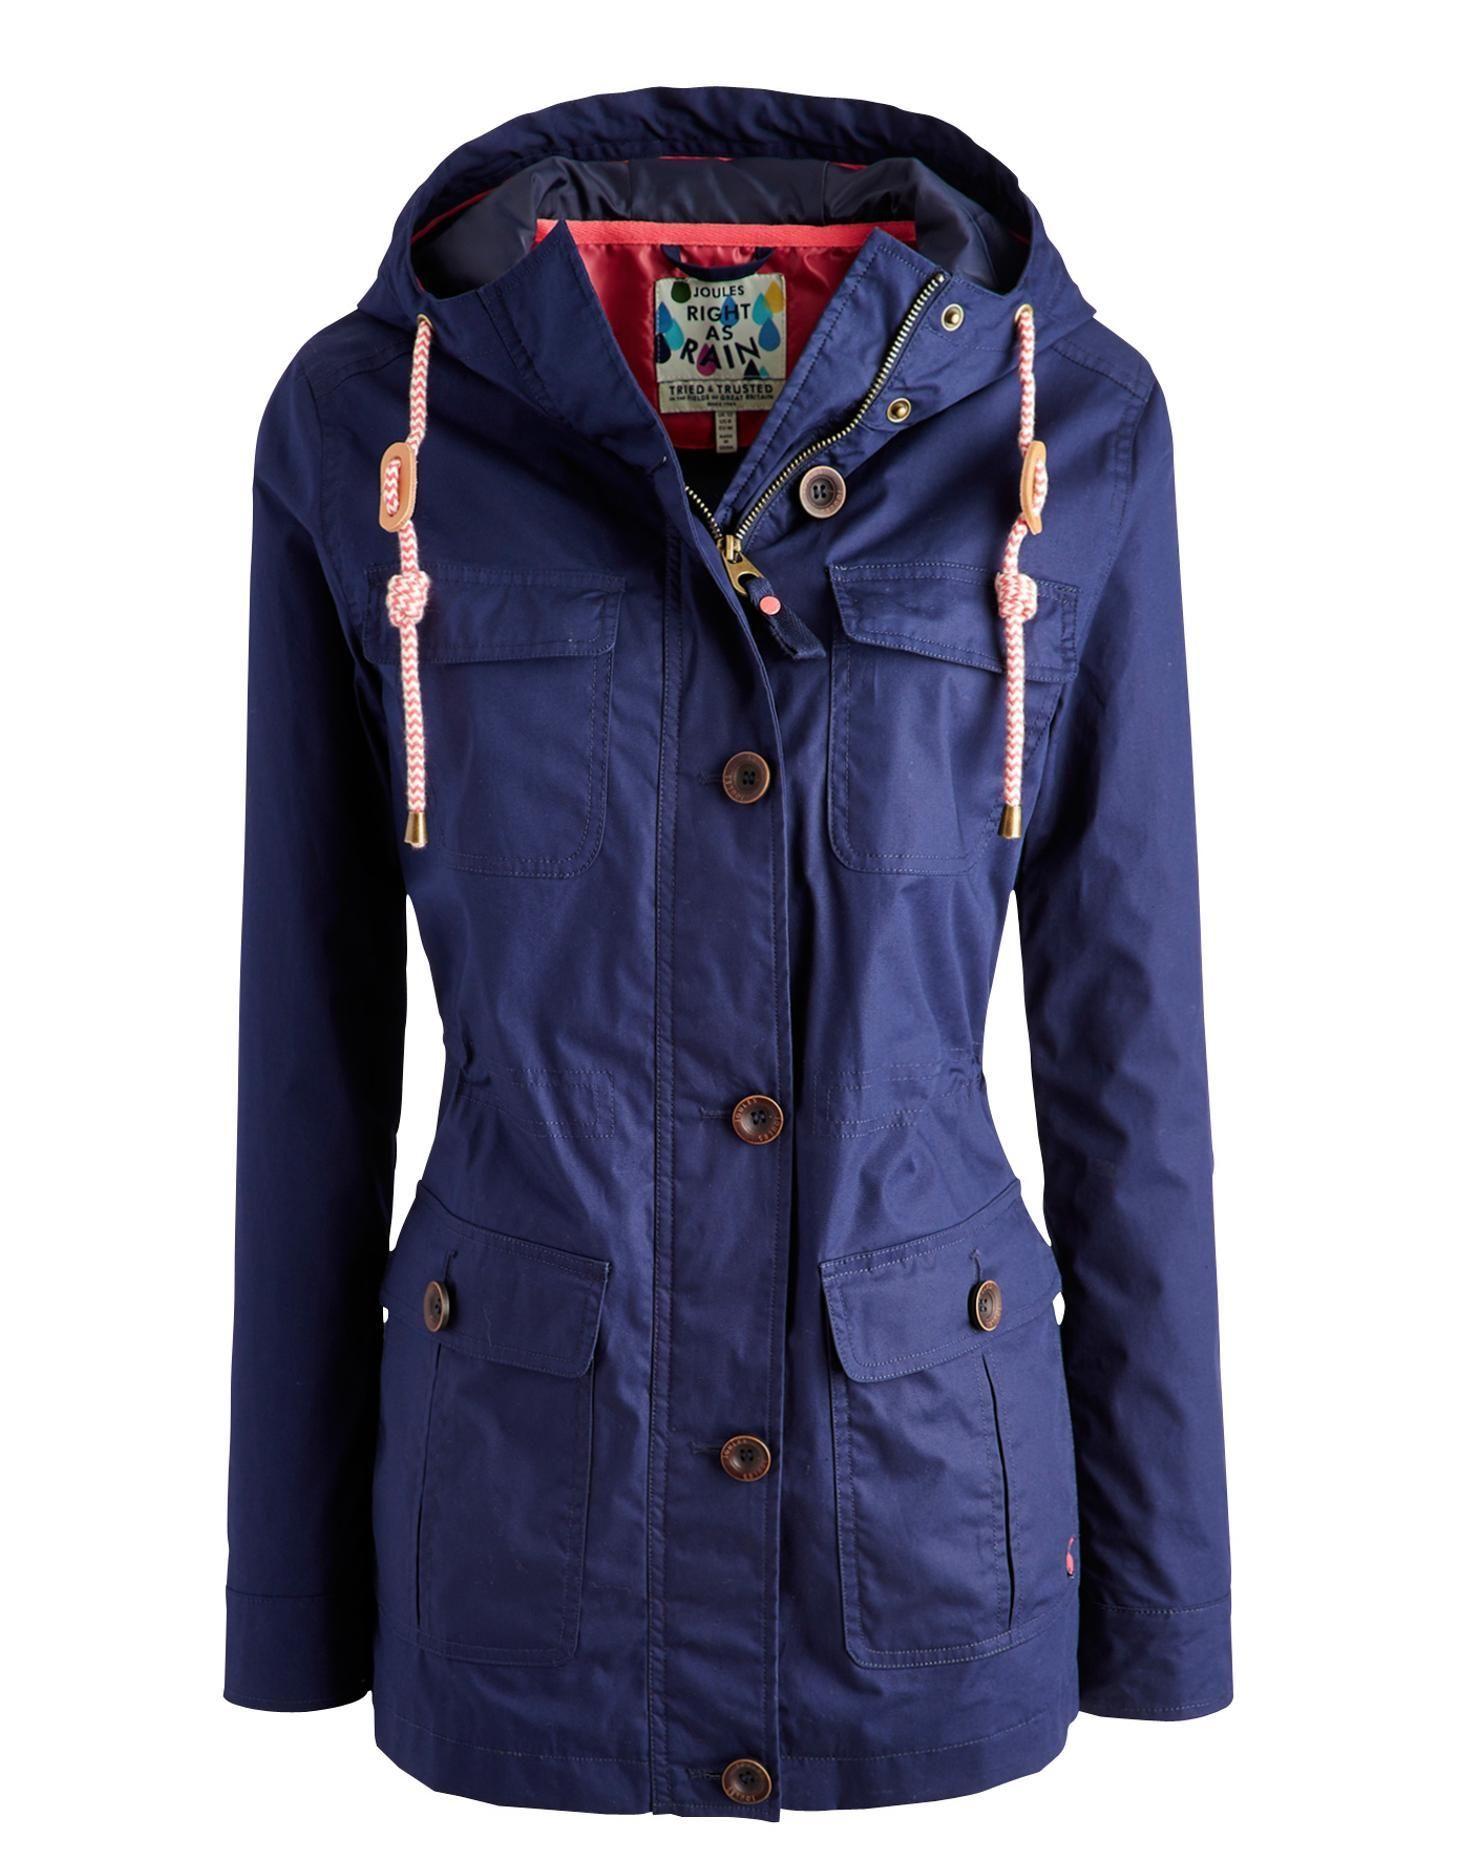 Womens 3in1 waterproof jacket